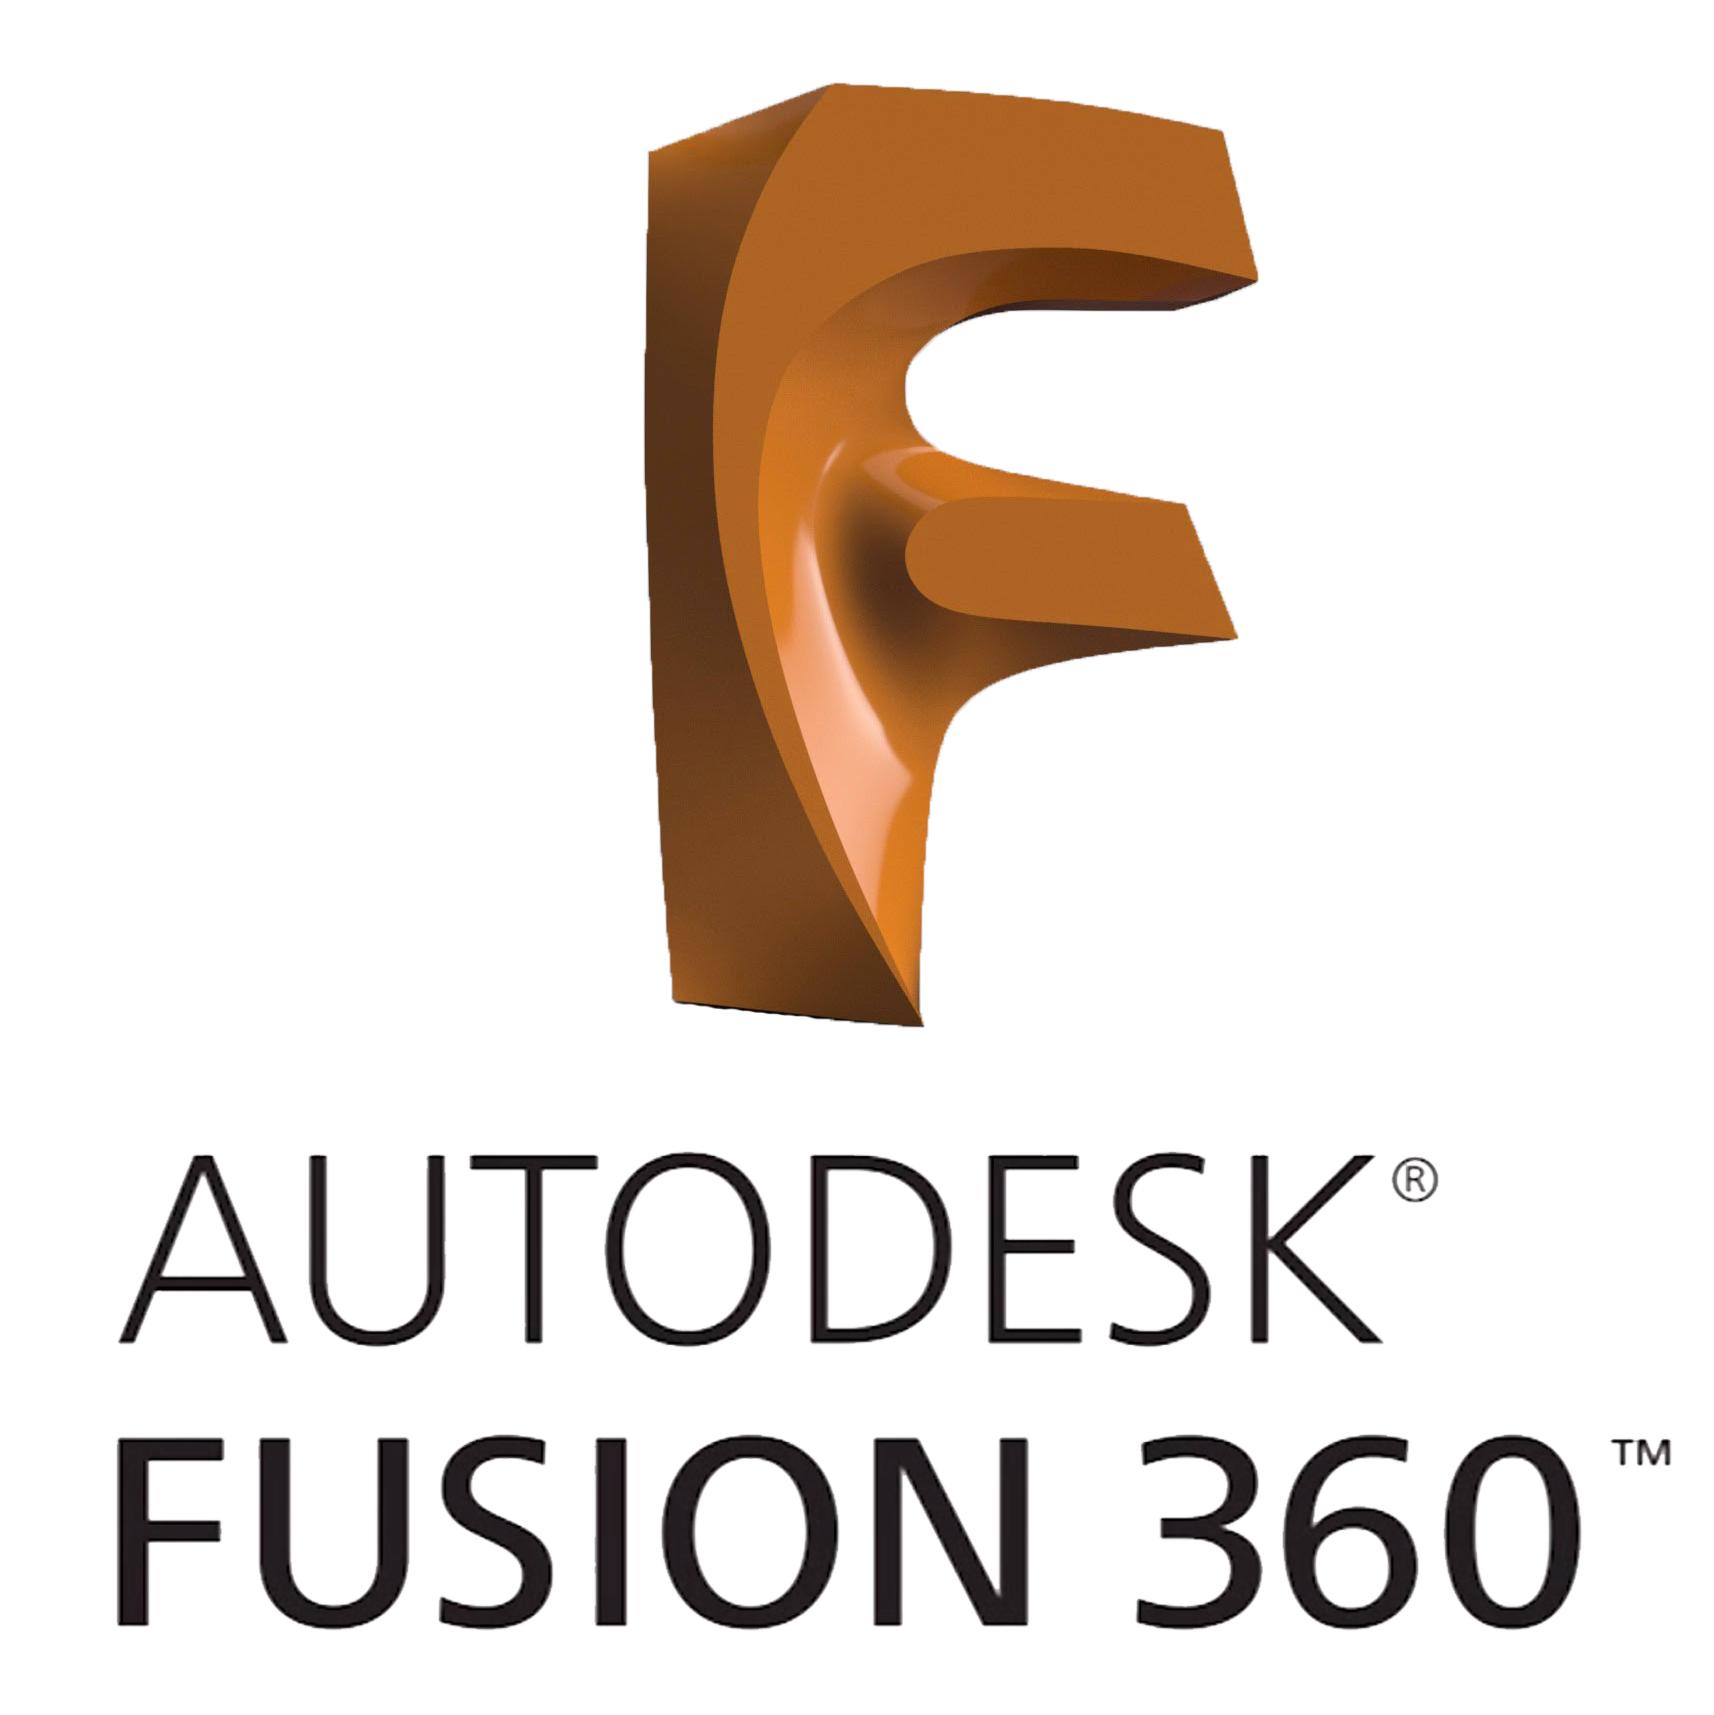 Autodesk Fusion 360 Crack v2.0.8749 & License Key Full